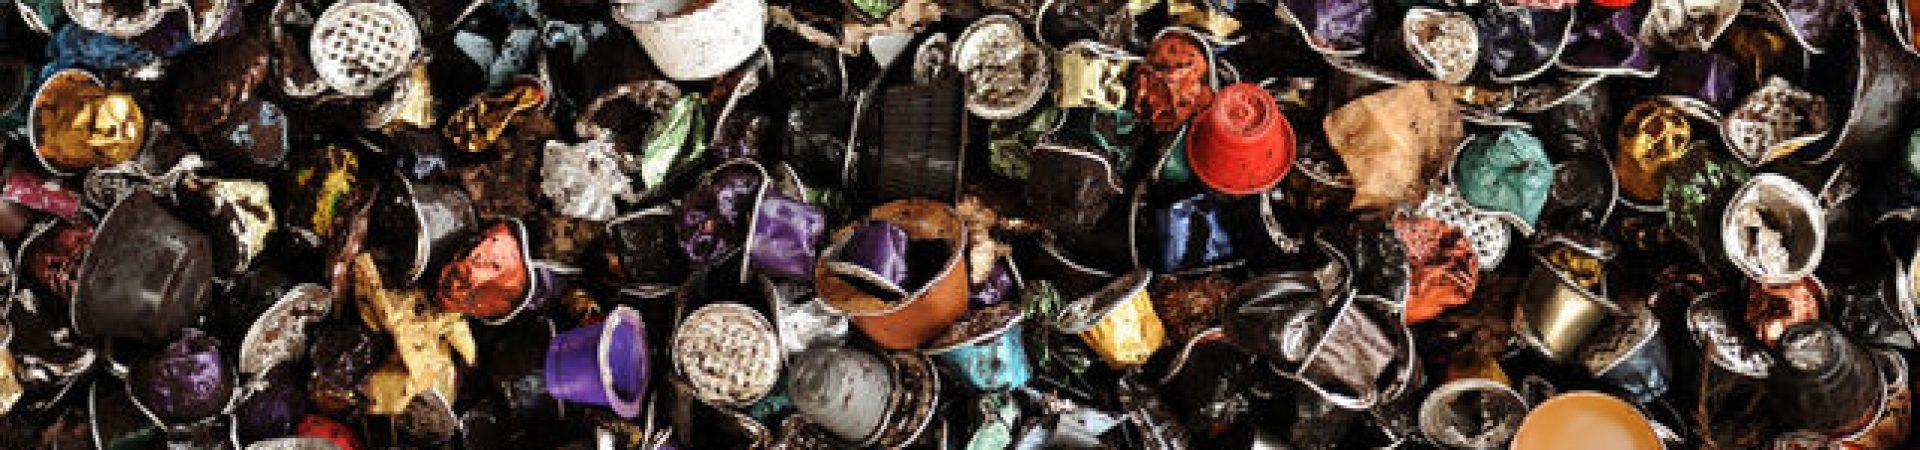 Capsulas-usadas-compostaje-Tradebe-Jorba_EDIIMA20191218_0694_20